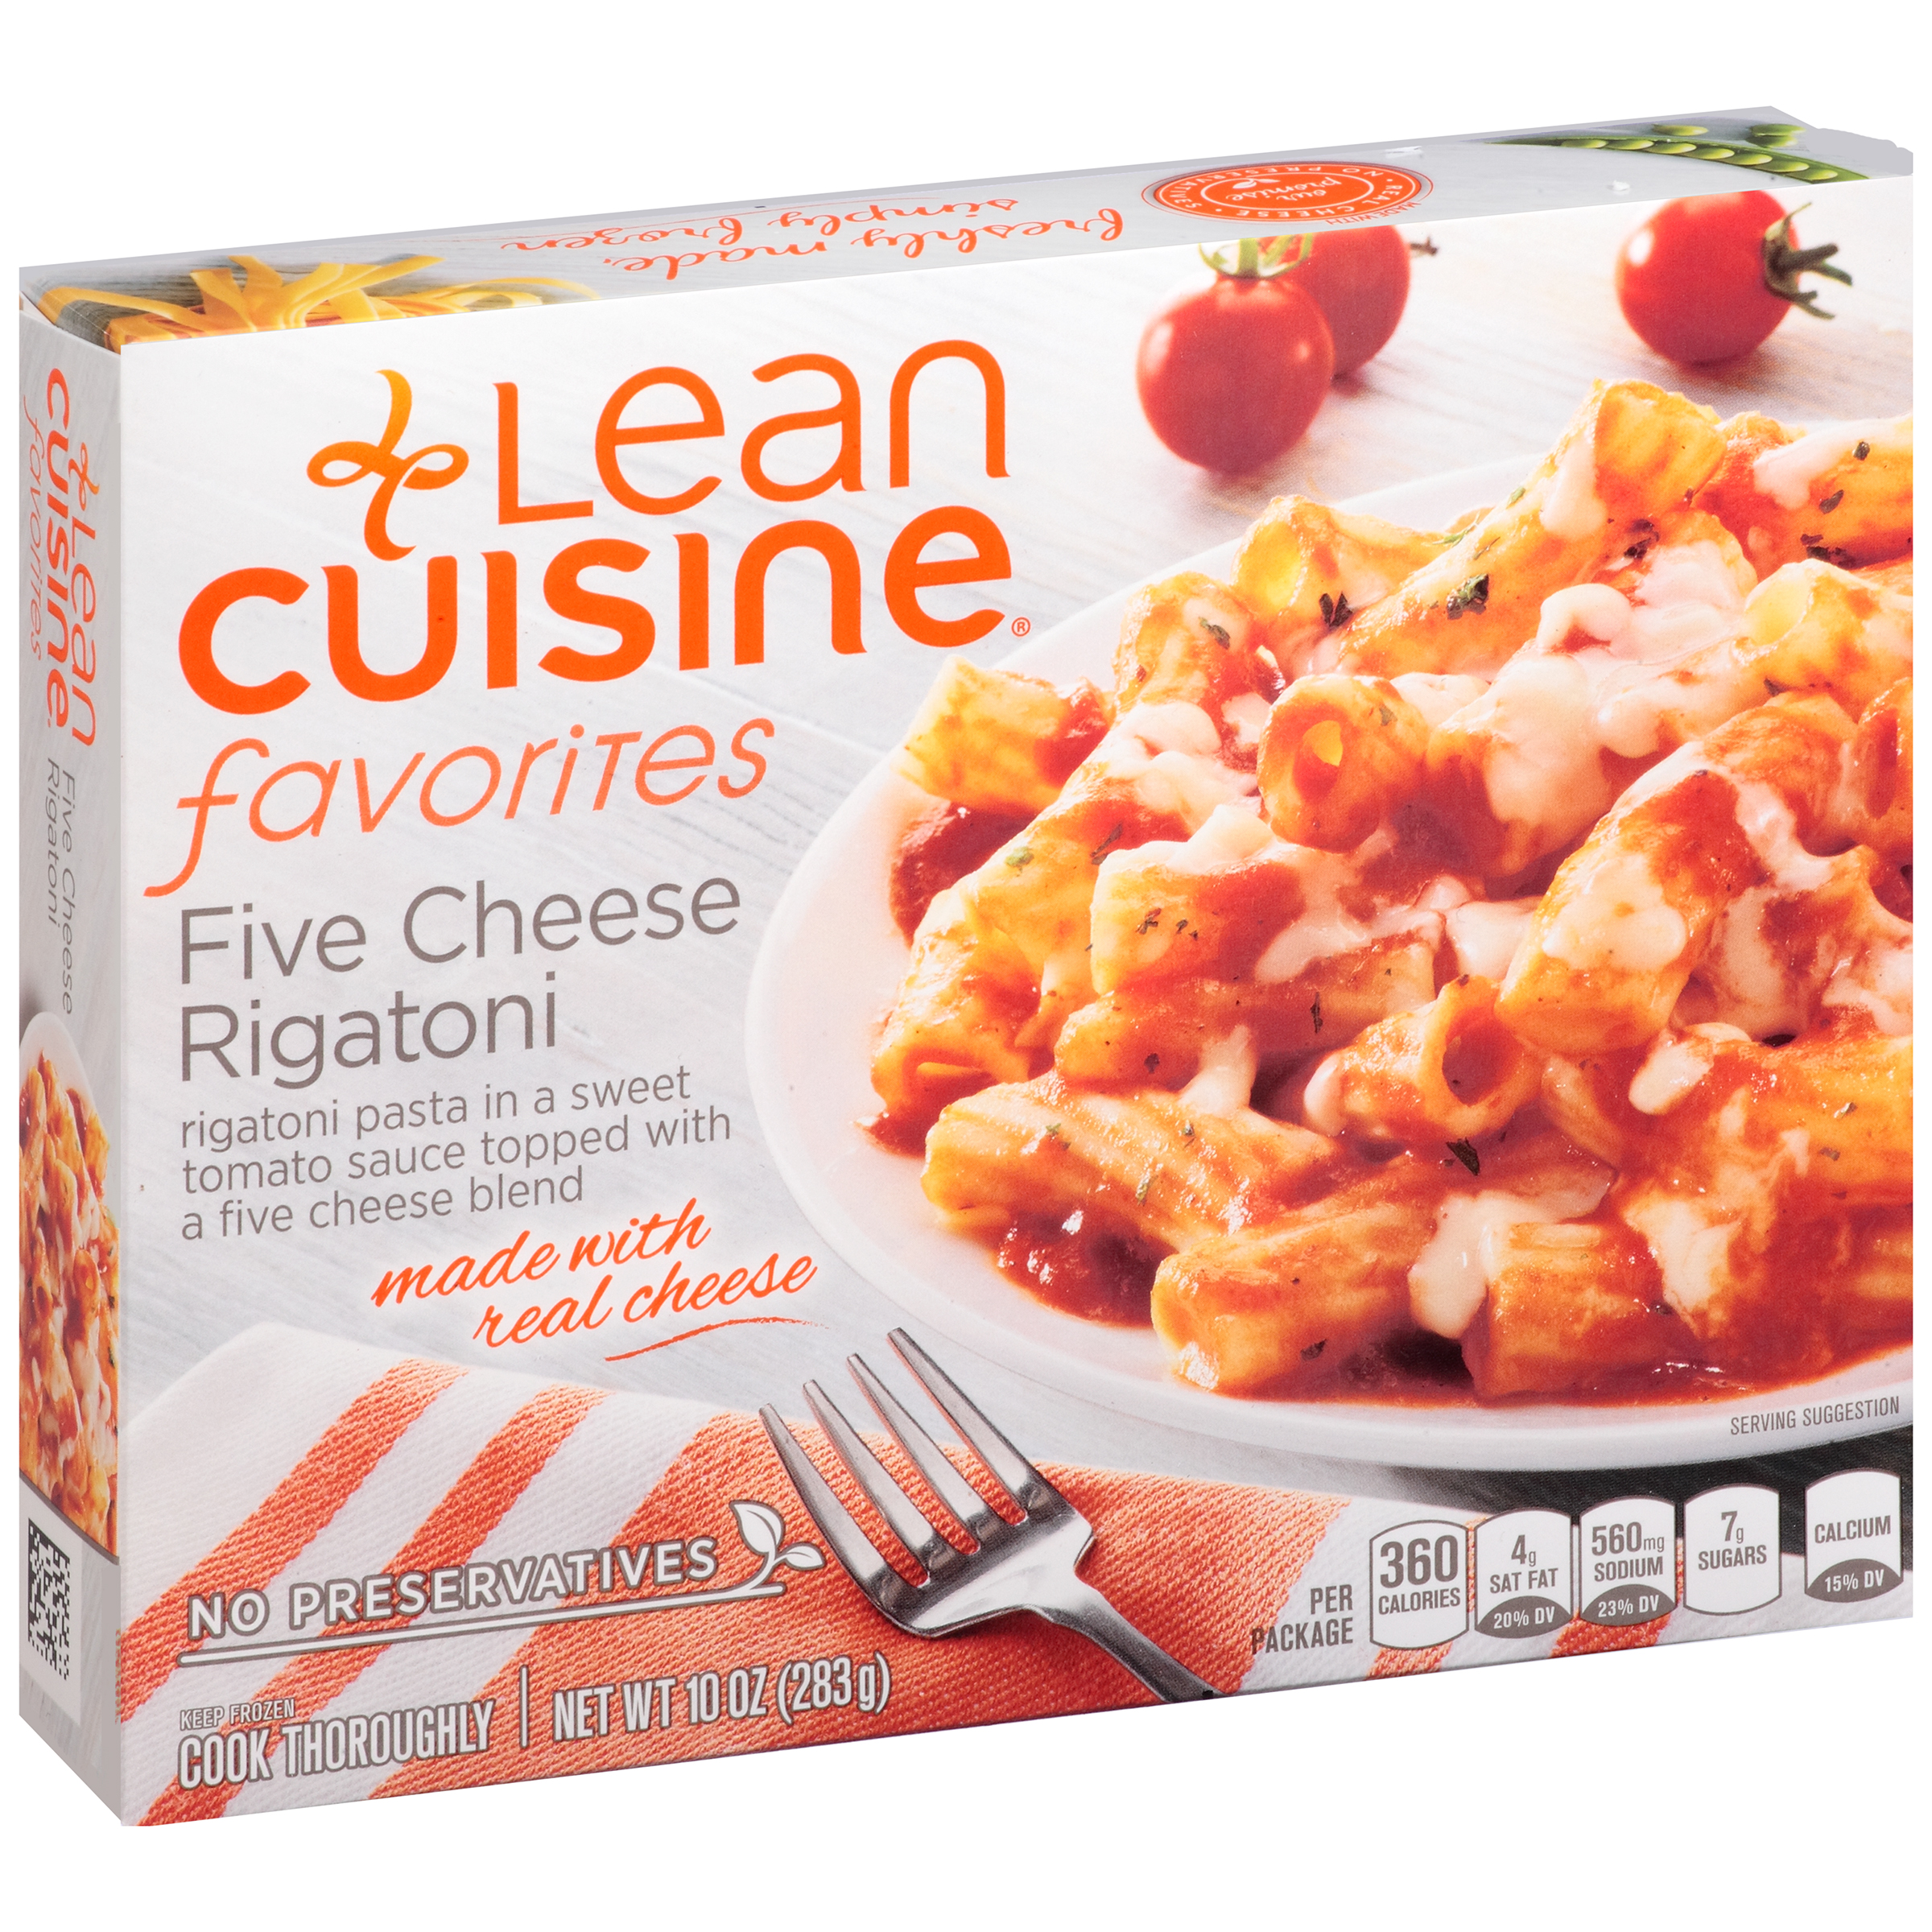 LEAN CUISINE FAVORITES Five Cheese Rigatoni 10 oz. Box